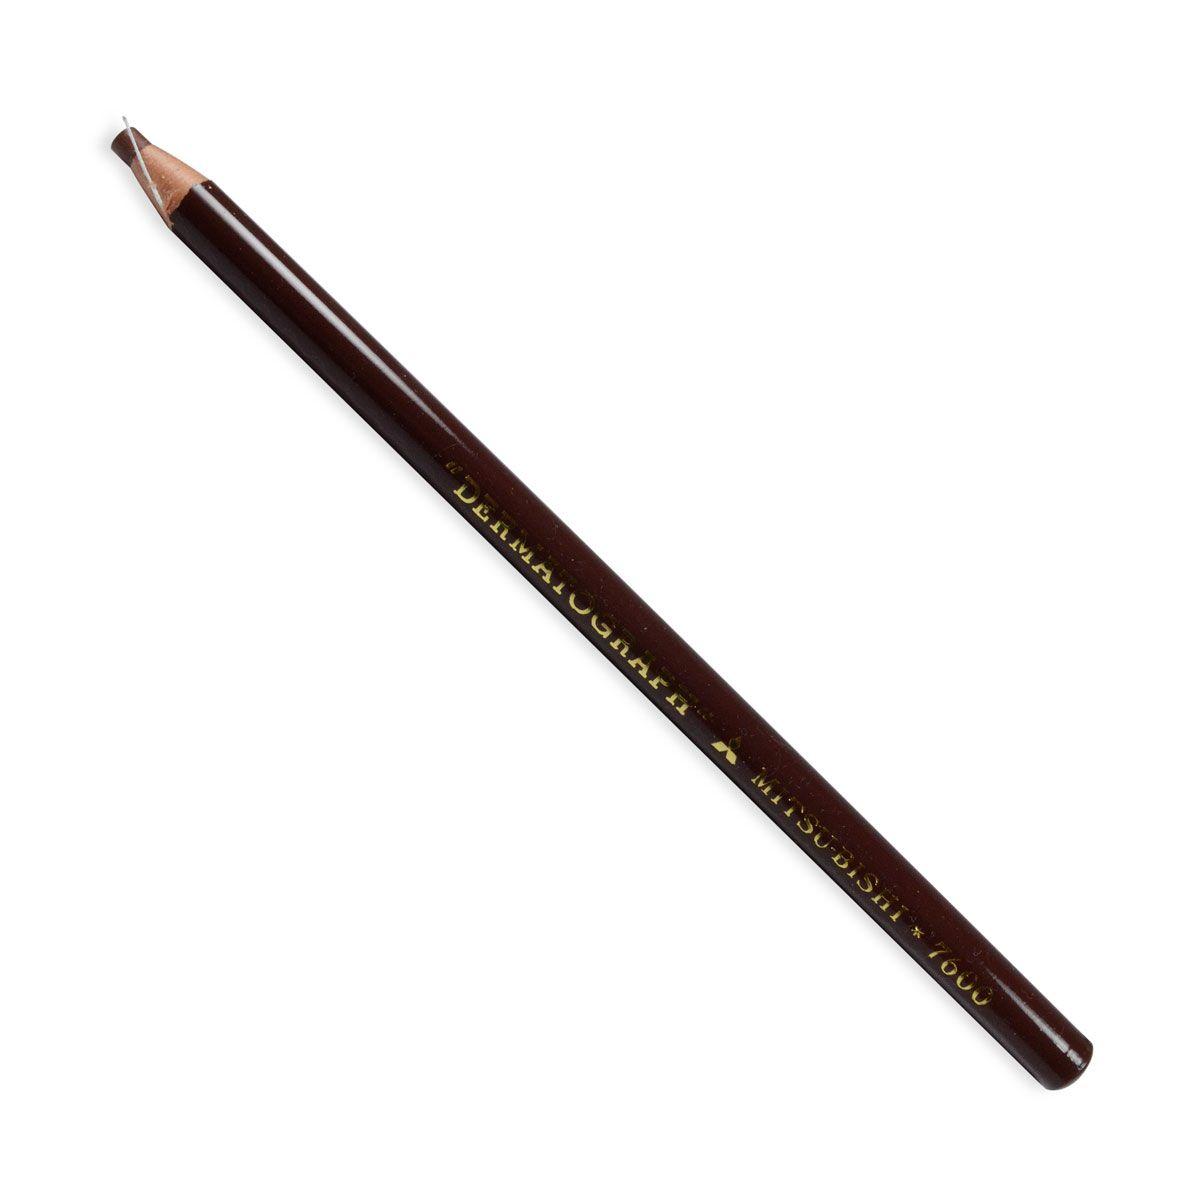 Lápis Dermatográfico Mitsubishi 7600 Cores